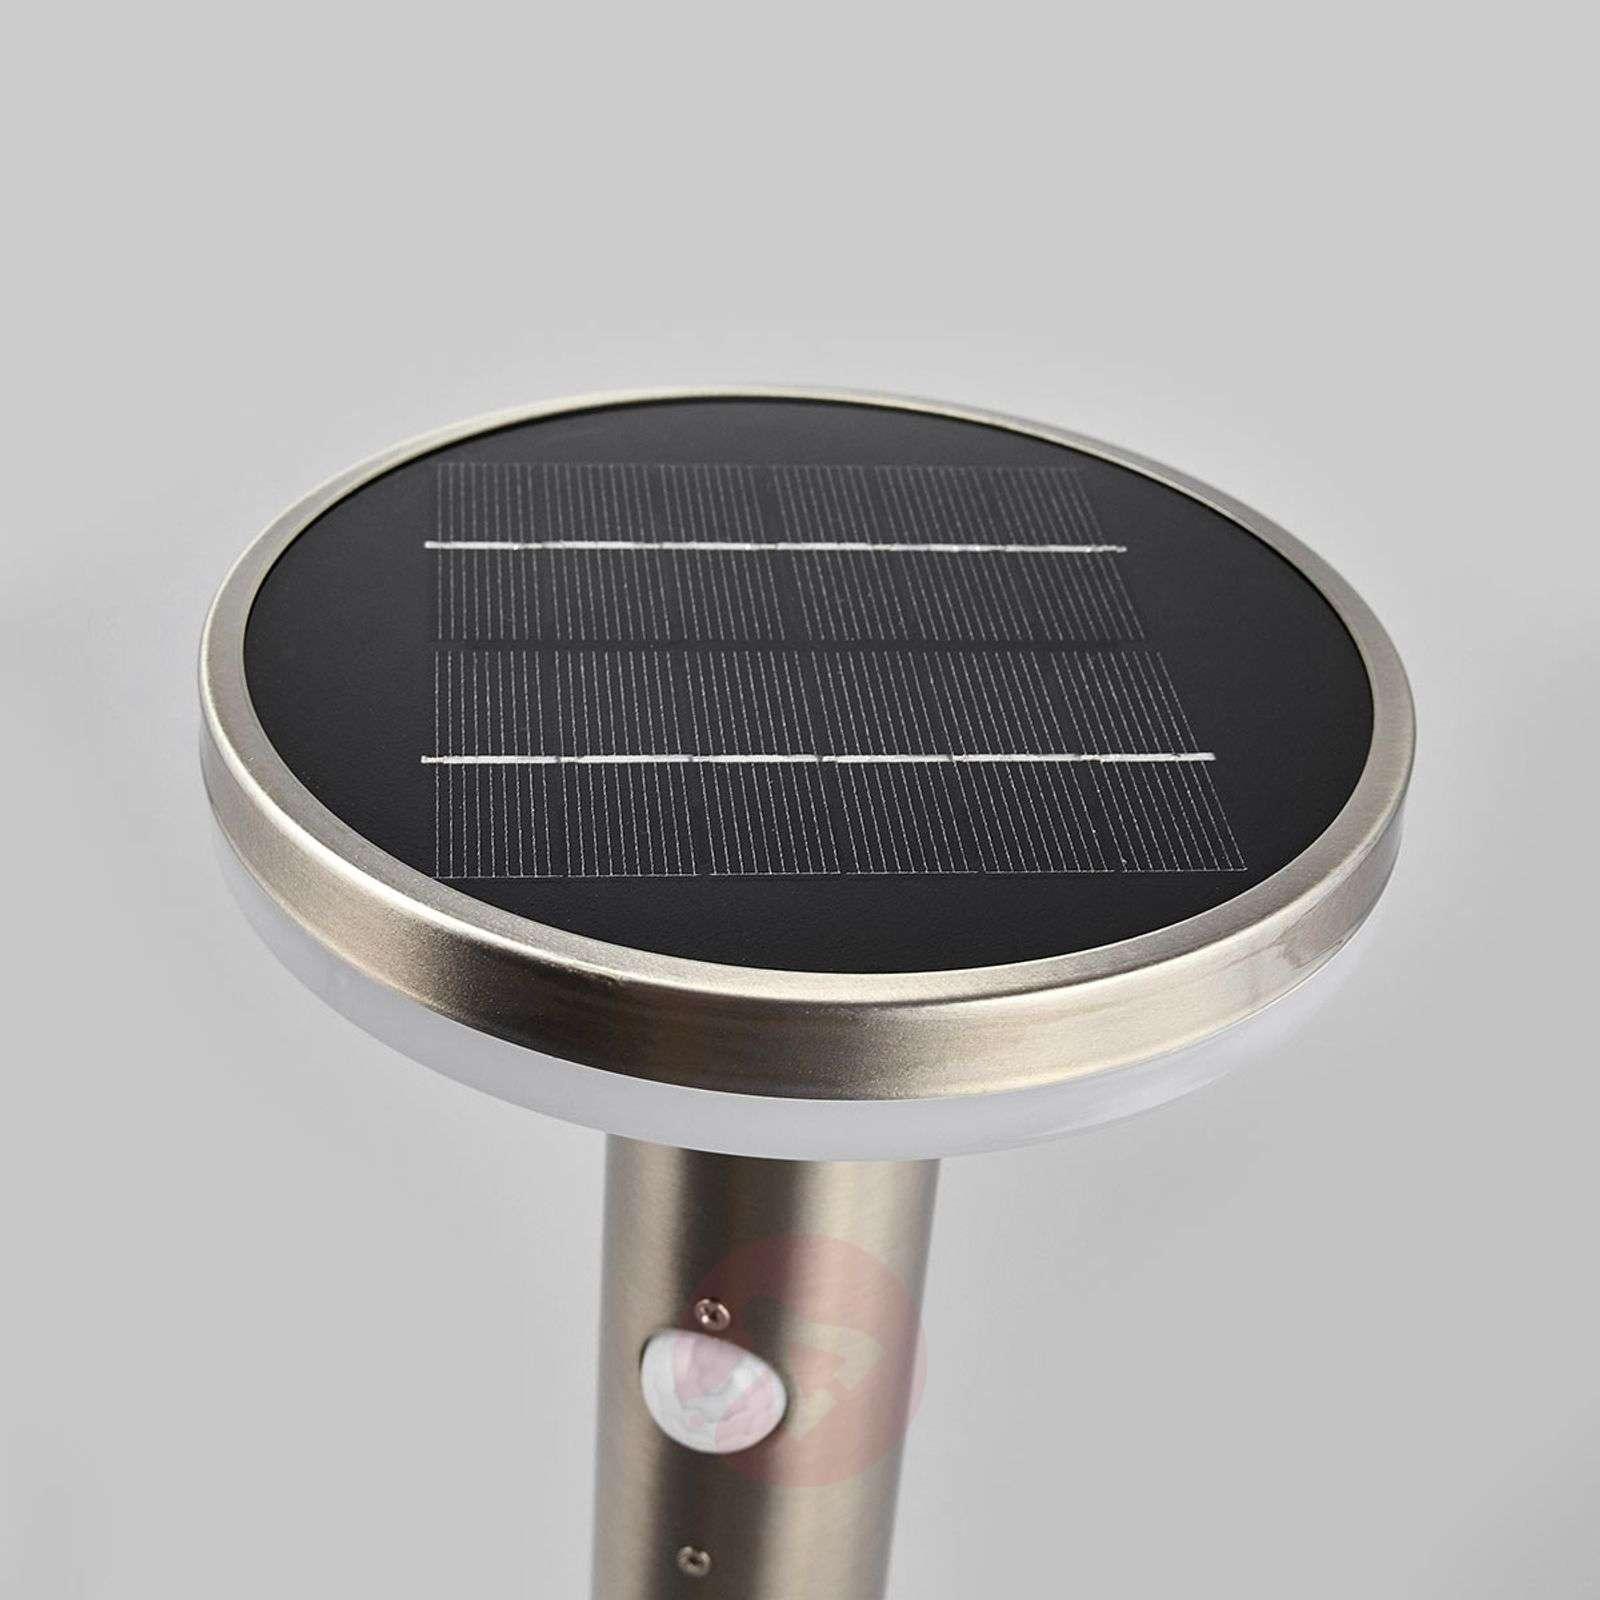 Aurinkokäyt. LED-pollarilamppu Eliano tunnist.-9988181-01